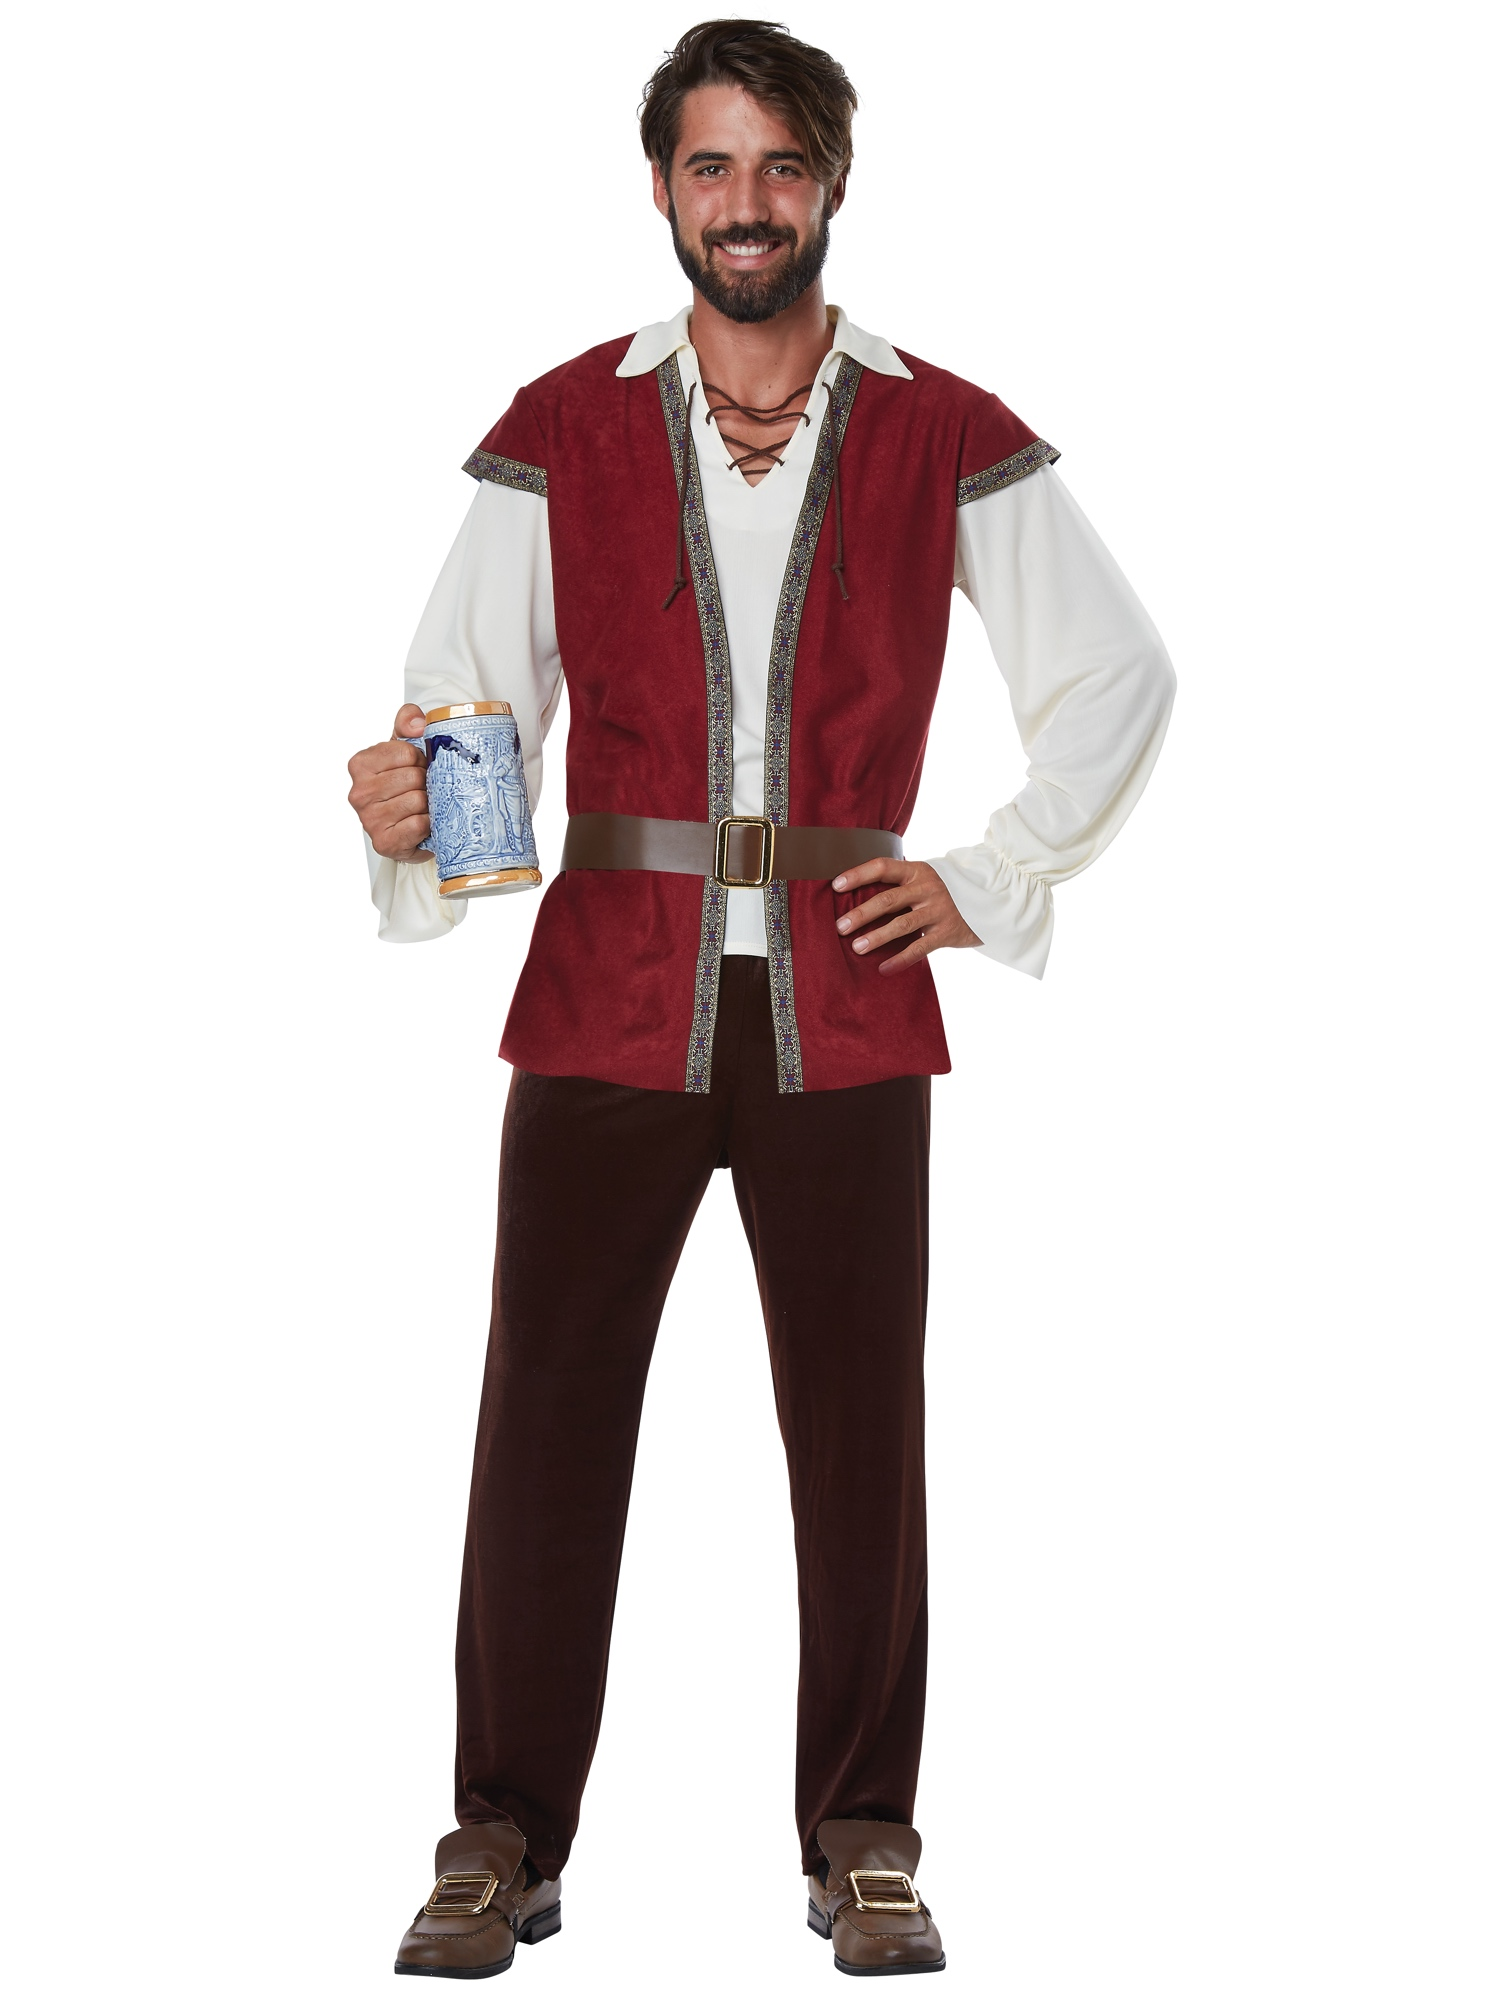 XL Mens Oktoberfest Tavern Man Game of Thrones Medieval Costume Size S